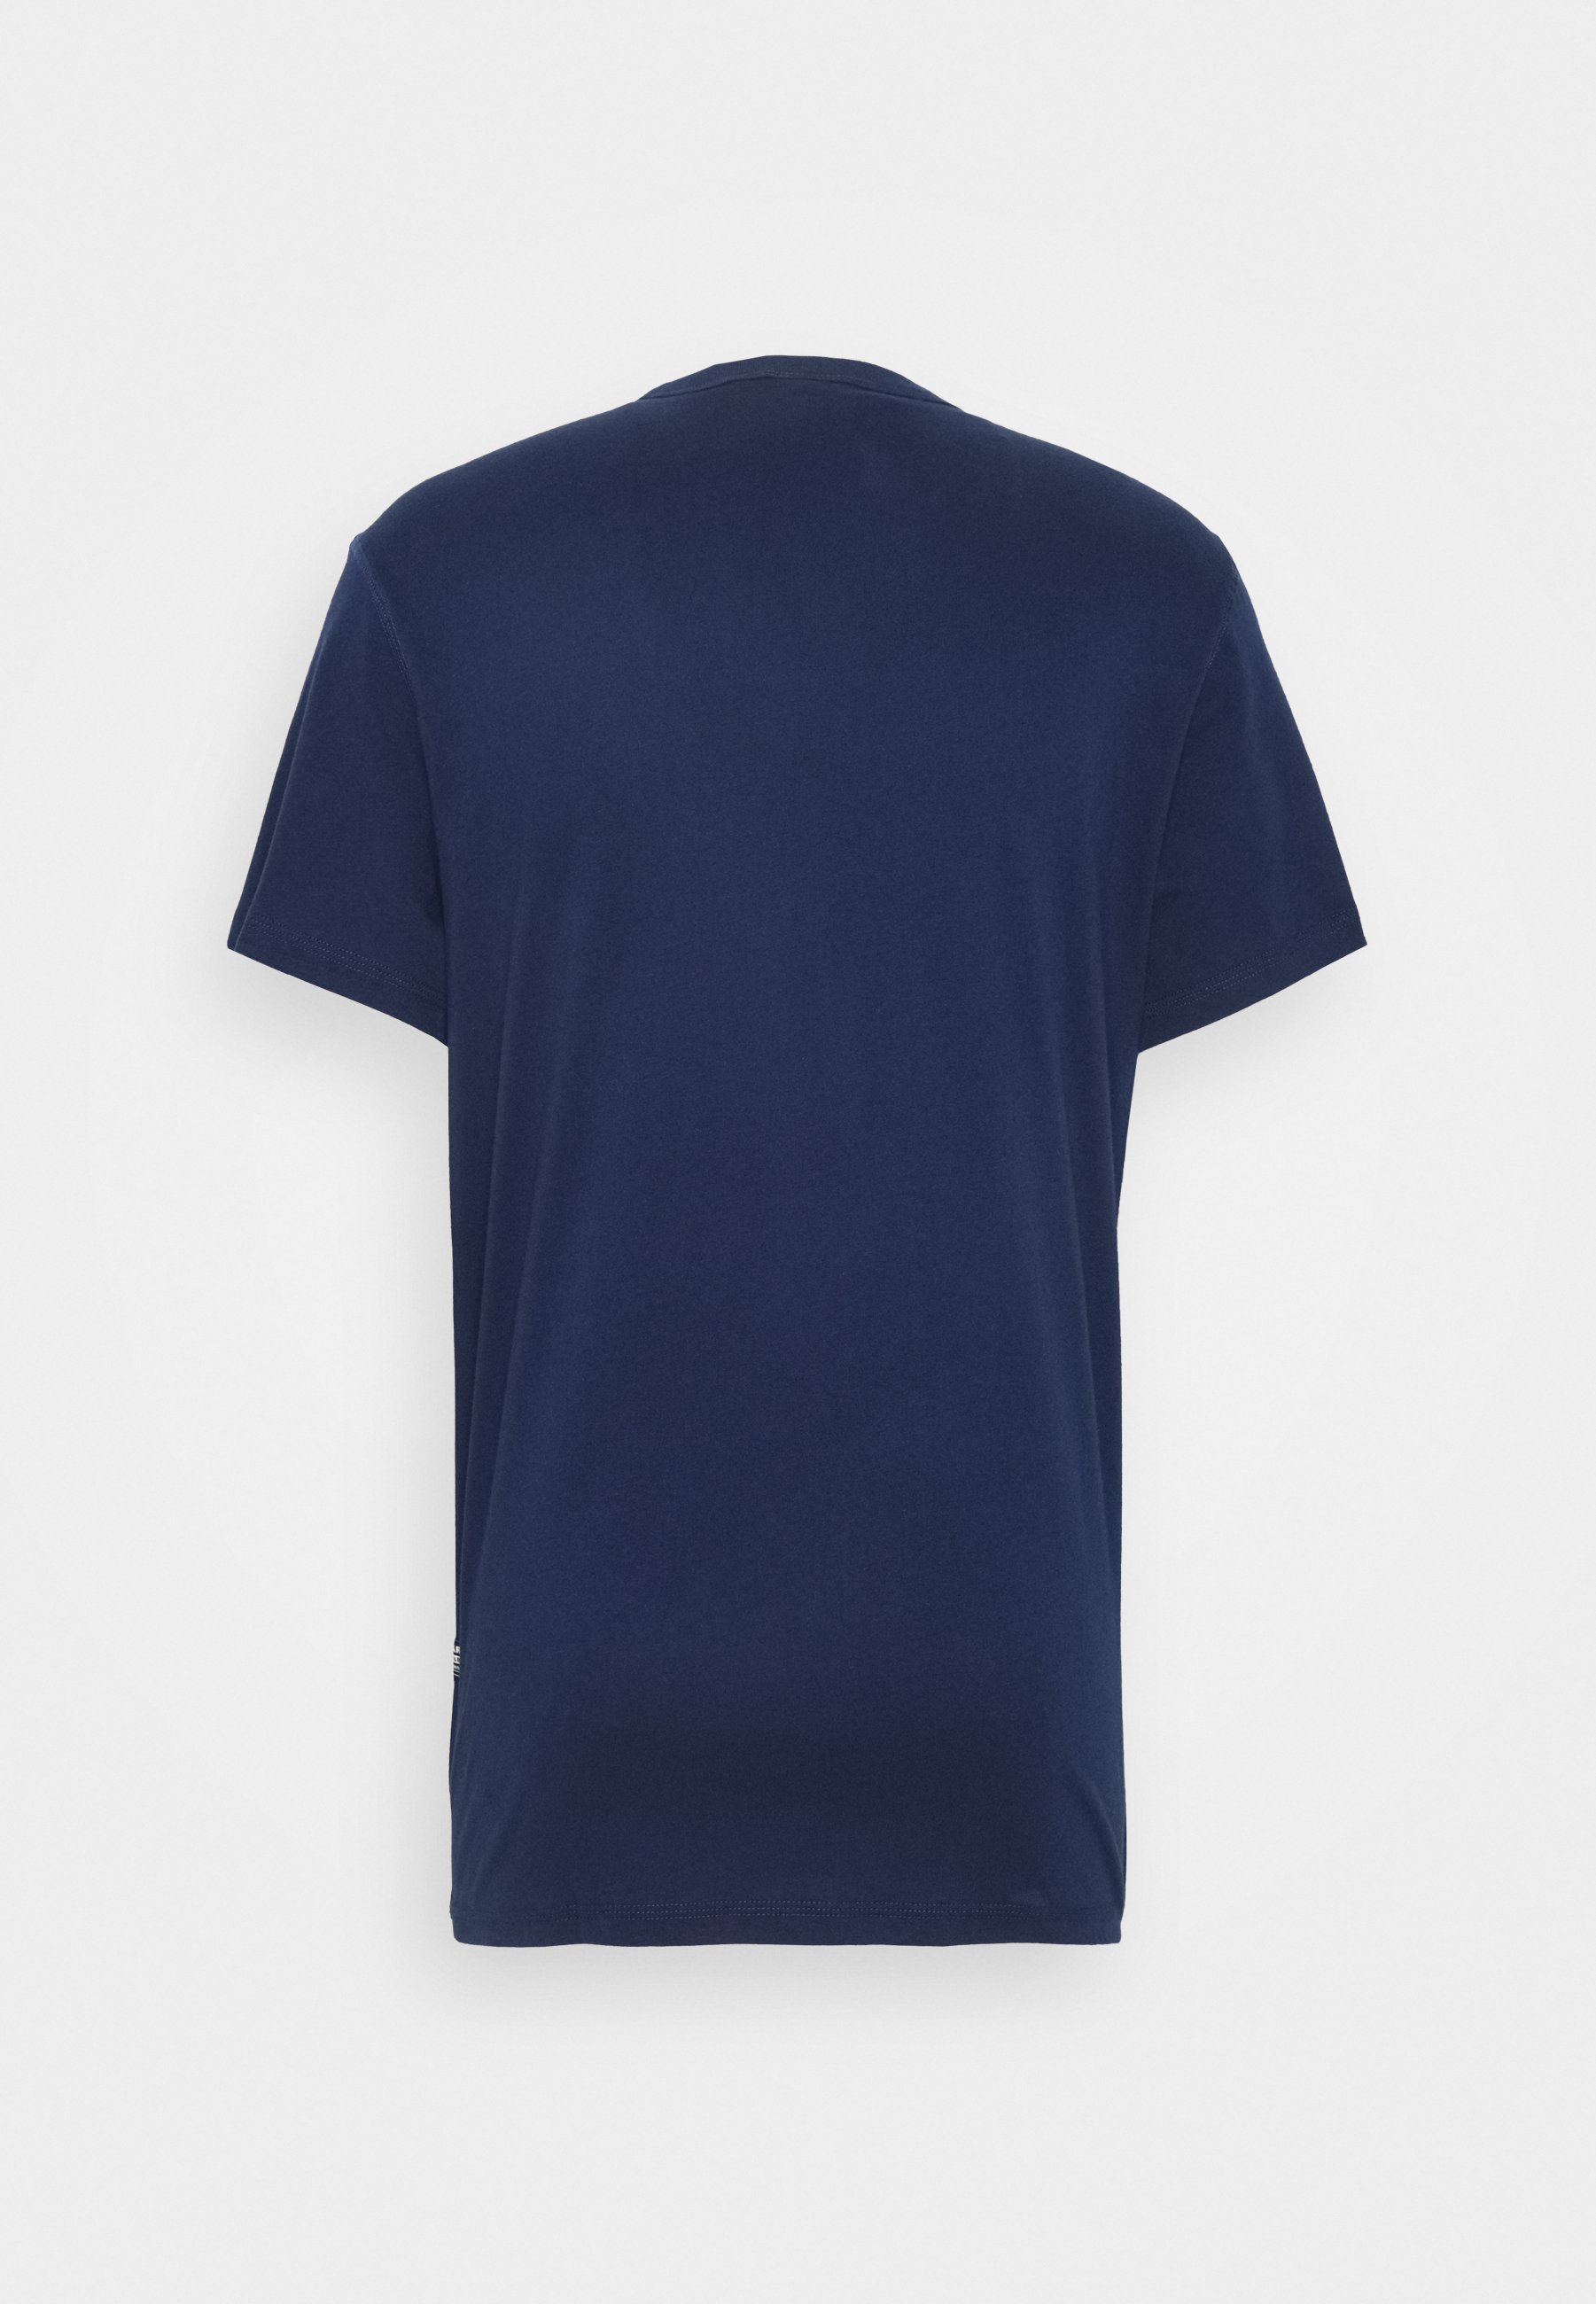 G-star Wavy Logo Originals R T S\s - T-shirts Med Print Compact Peach/imperial Blue